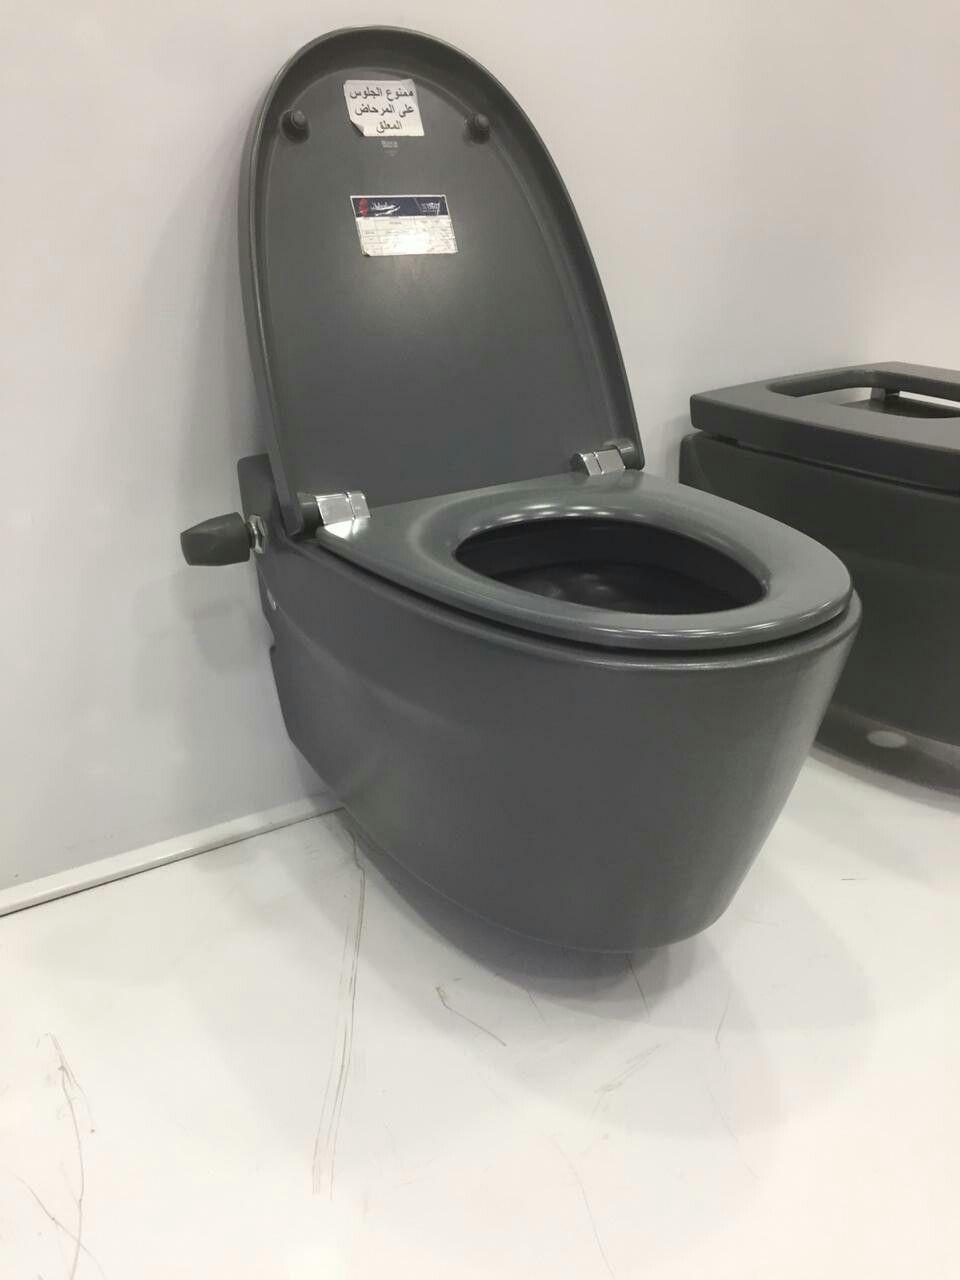 Pin By Gamal Elsemairy On الشقة Bathroom Toilet